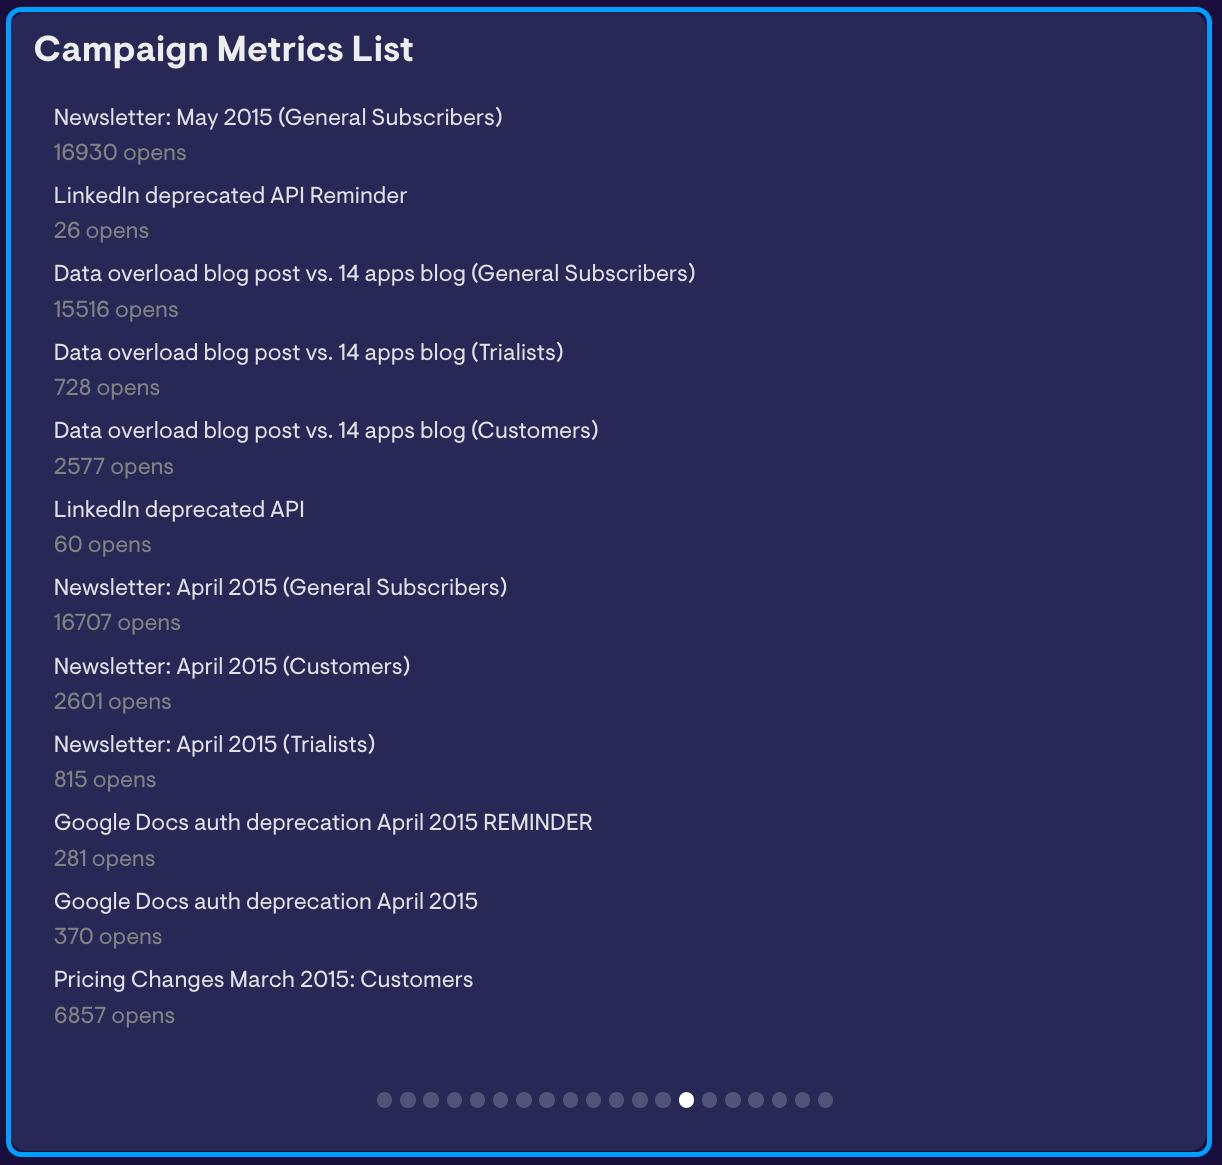 Campaign_Metrics_List_Widget.png